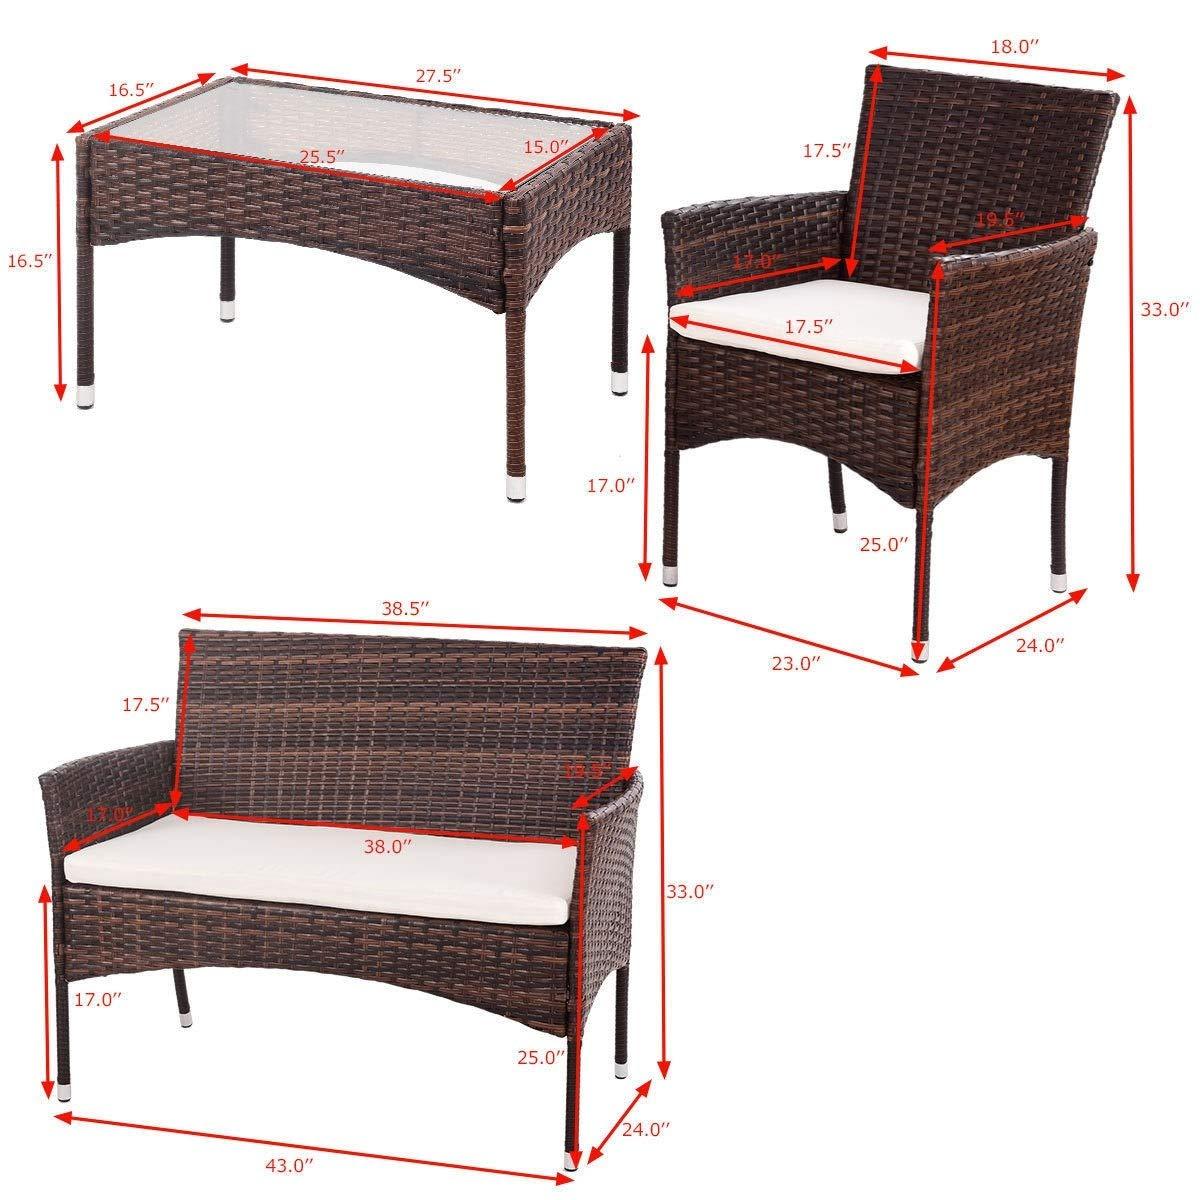 EnjoyShop 4 Pcs PE Rattan Wicker Table Shelf Sofa Furniture Set with Cushion Dining Garden Picnic Outdoor by EnjoyShop (Image #4)